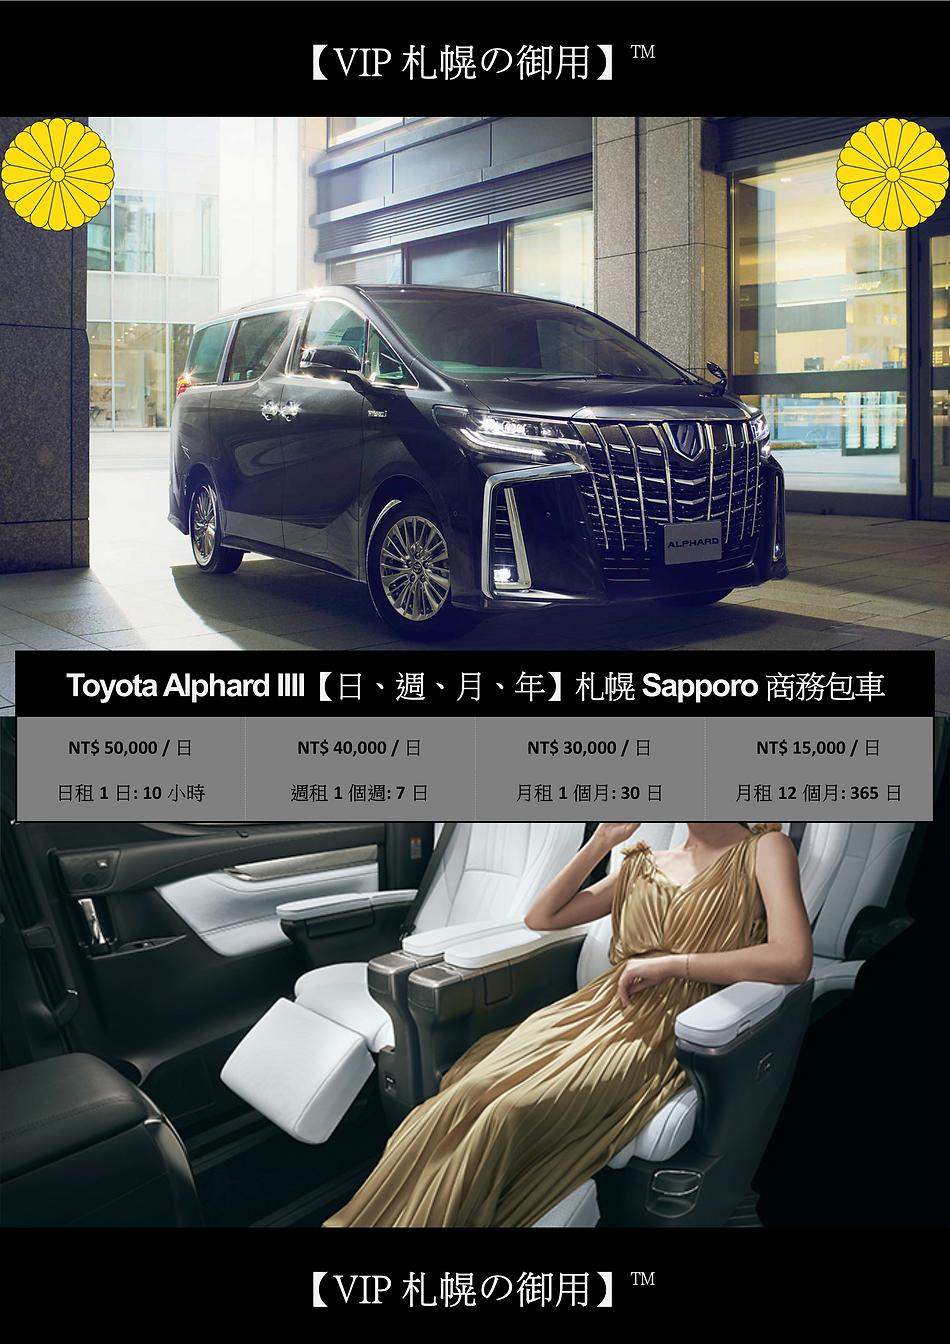 VIP札幌の御用 TOYOTA ALPHARD IIII 商務包車